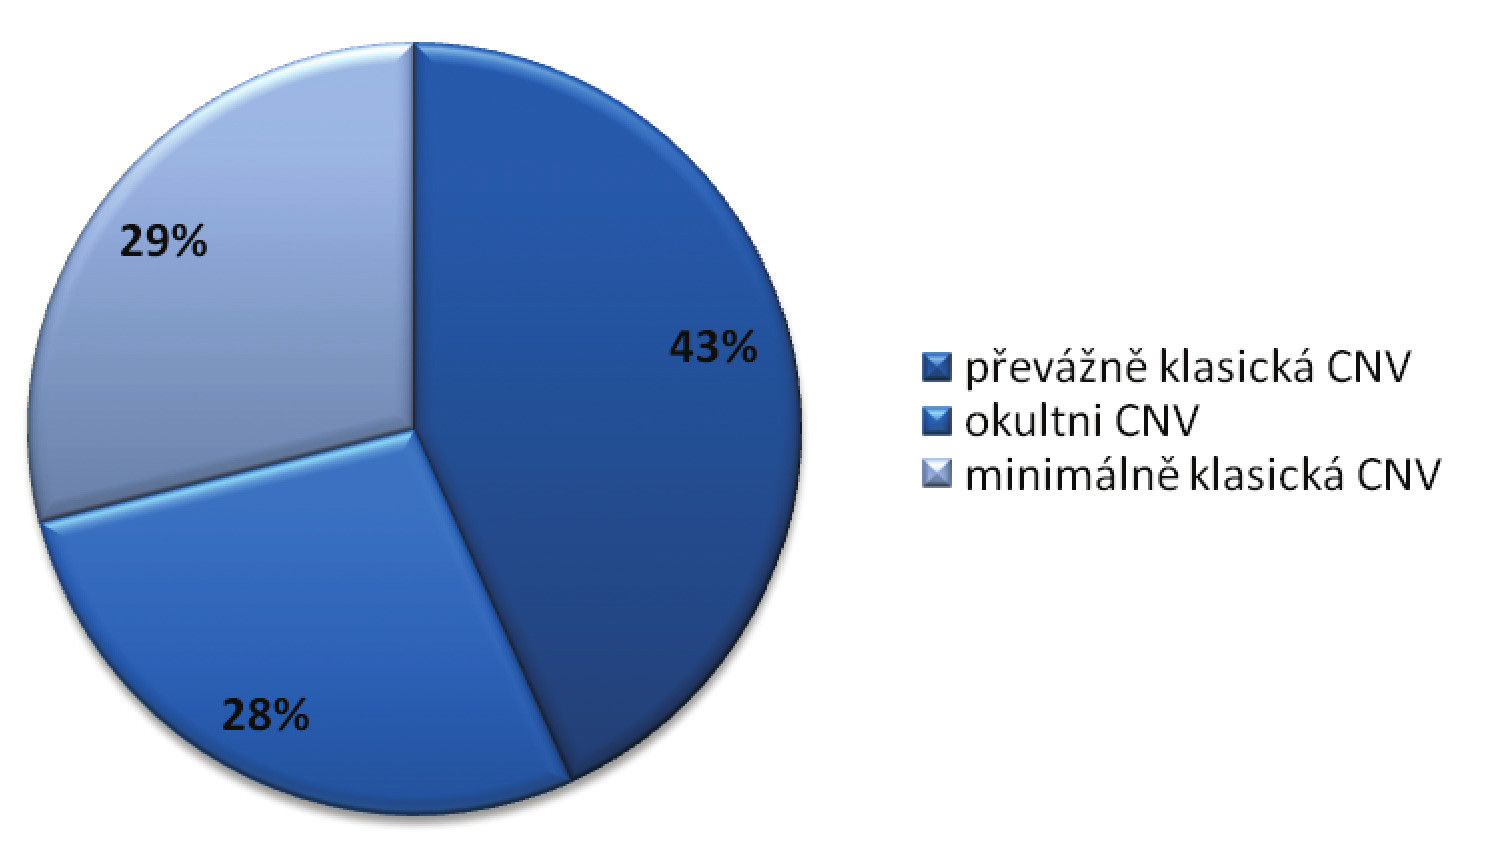 Charakteristika souboru dle typu CNV